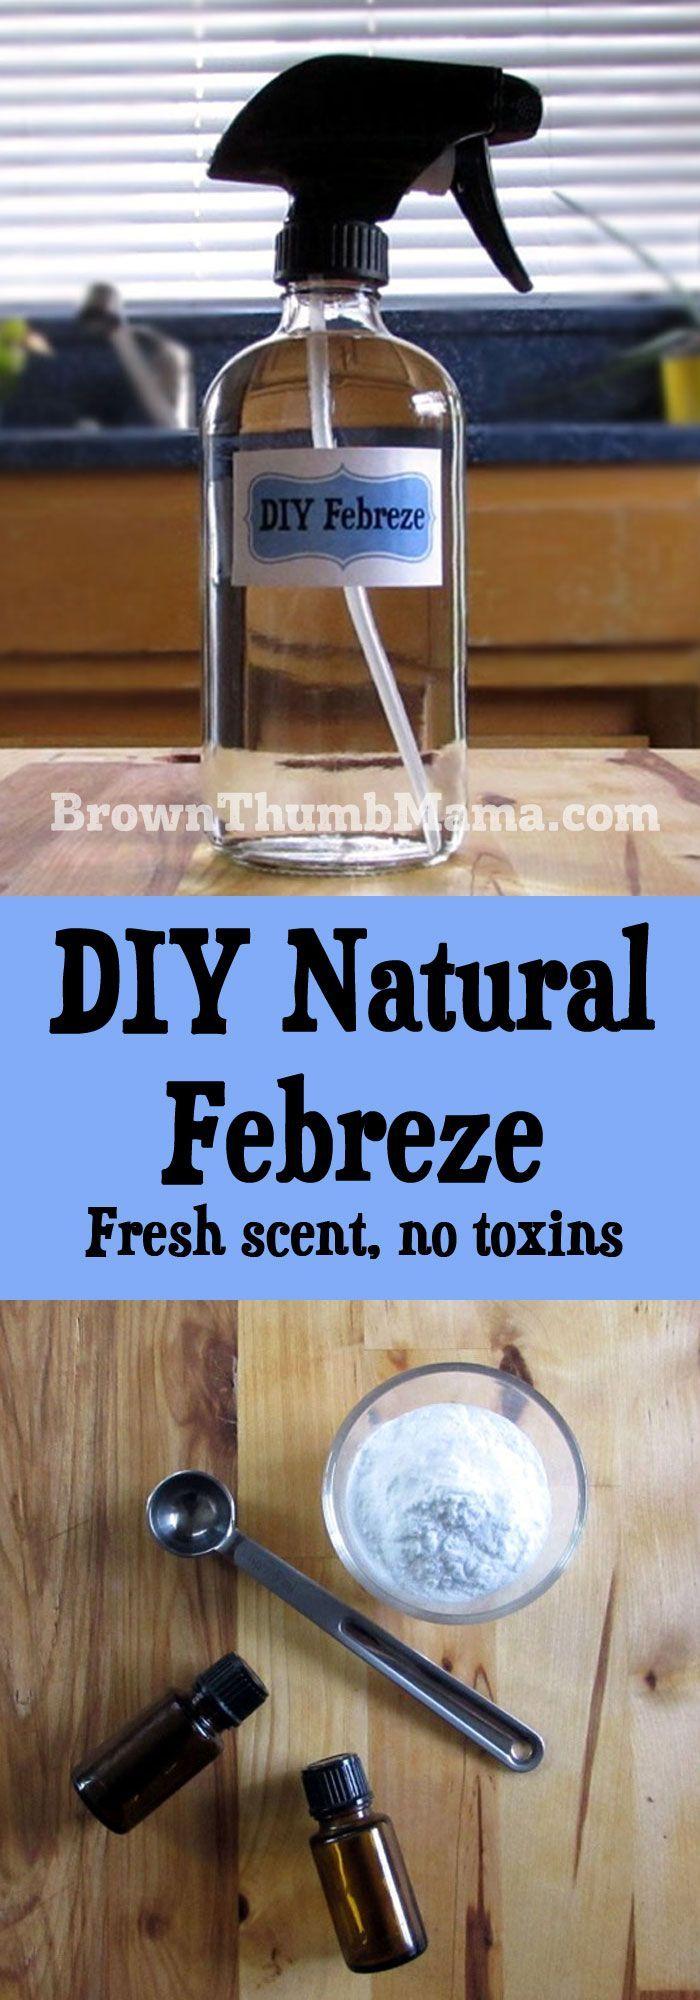 Homemade Natural Febreze